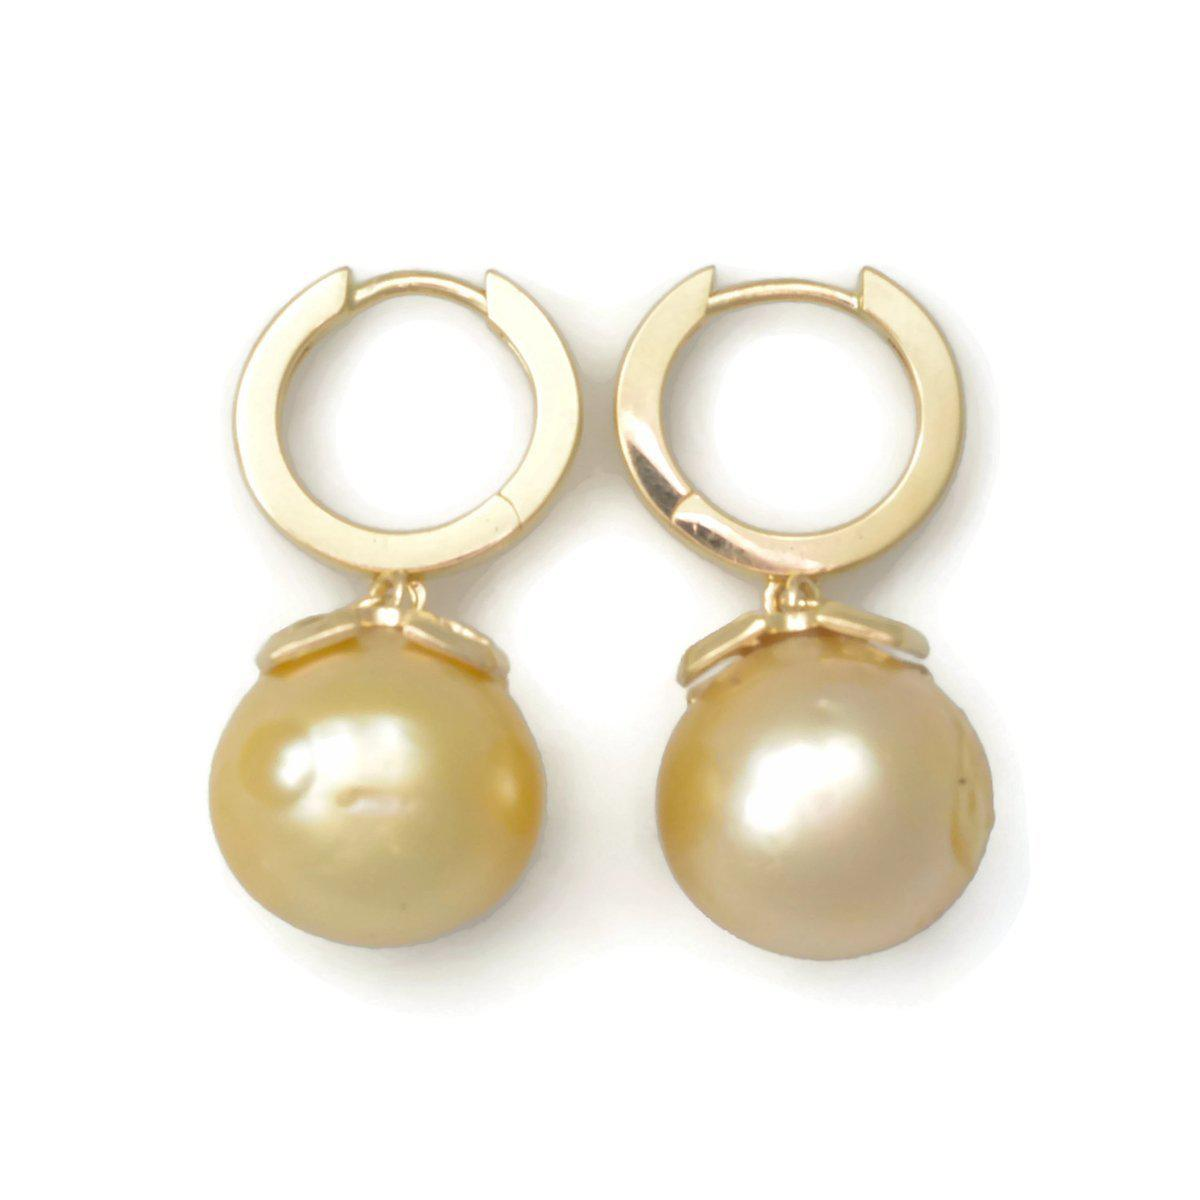 Donna Pizarro Designs 14kt Baroque Golden South Sea Earrings vi5tm